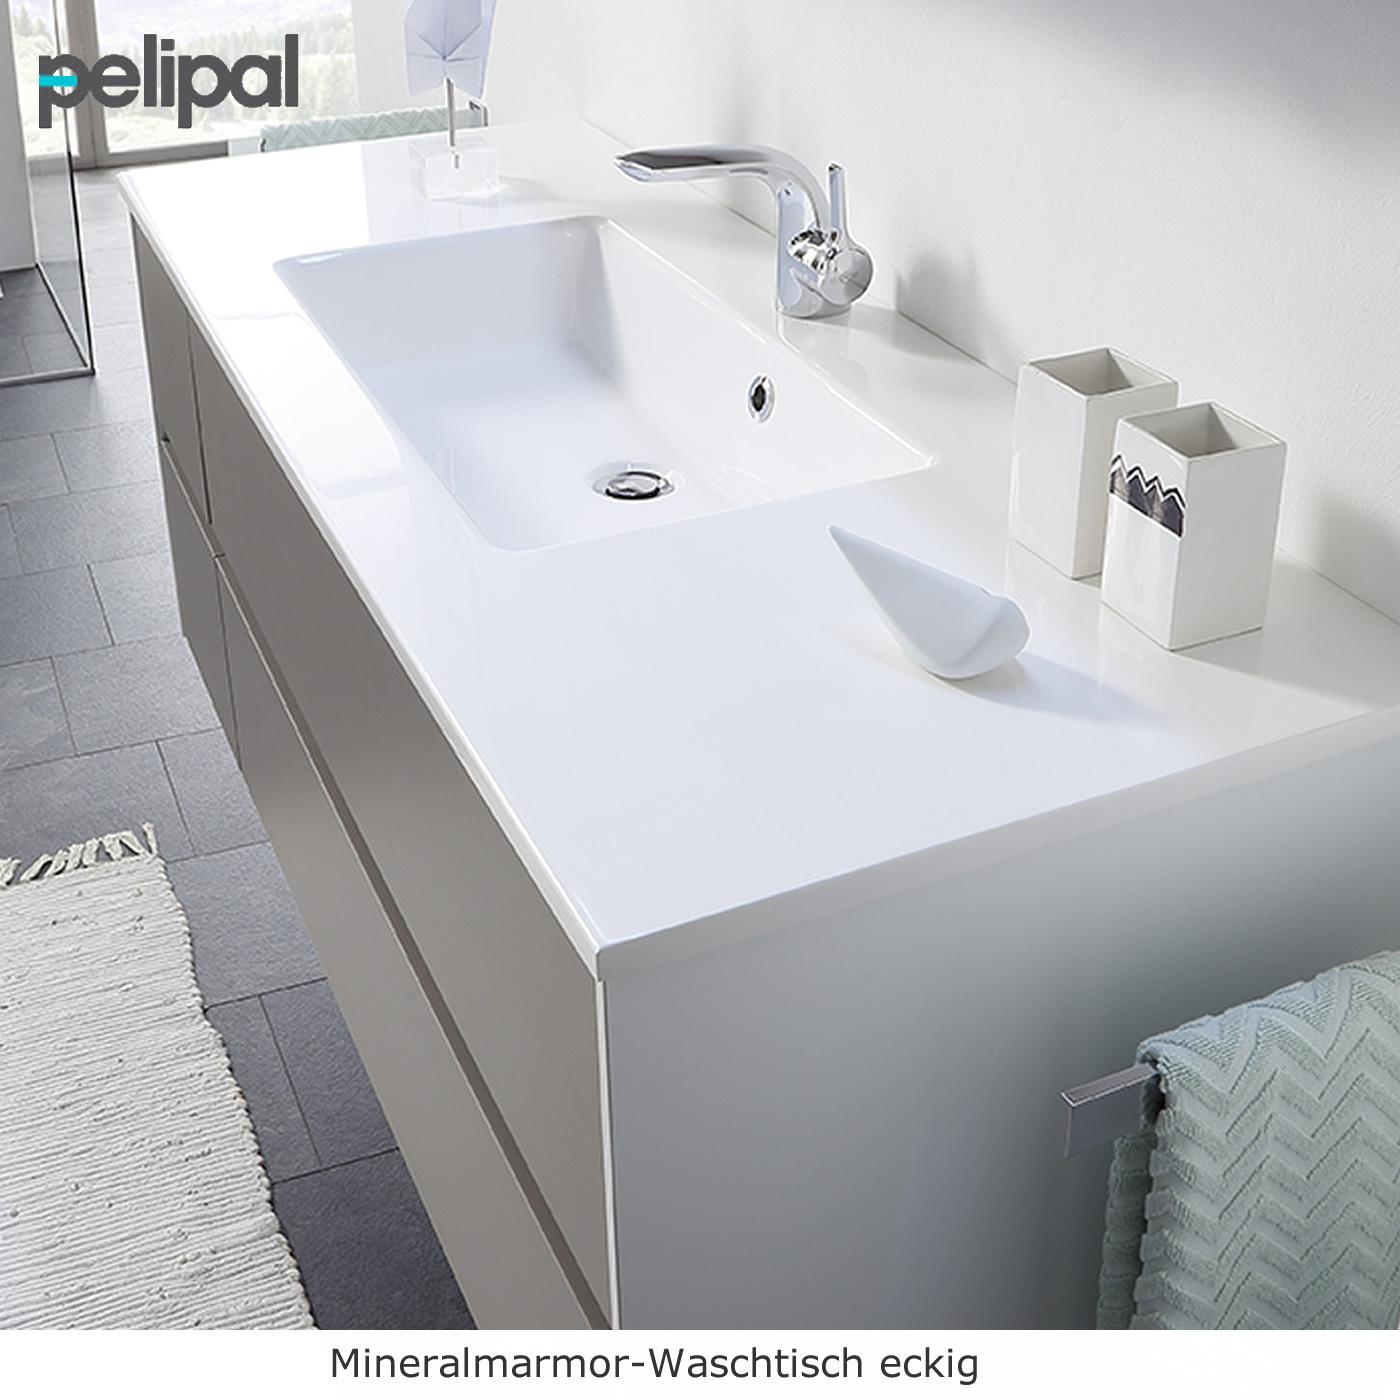 pelipal badm bel mit spiegelschrank als set solitaire 6010. Black Bedroom Furniture Sets. Home Design Ideas